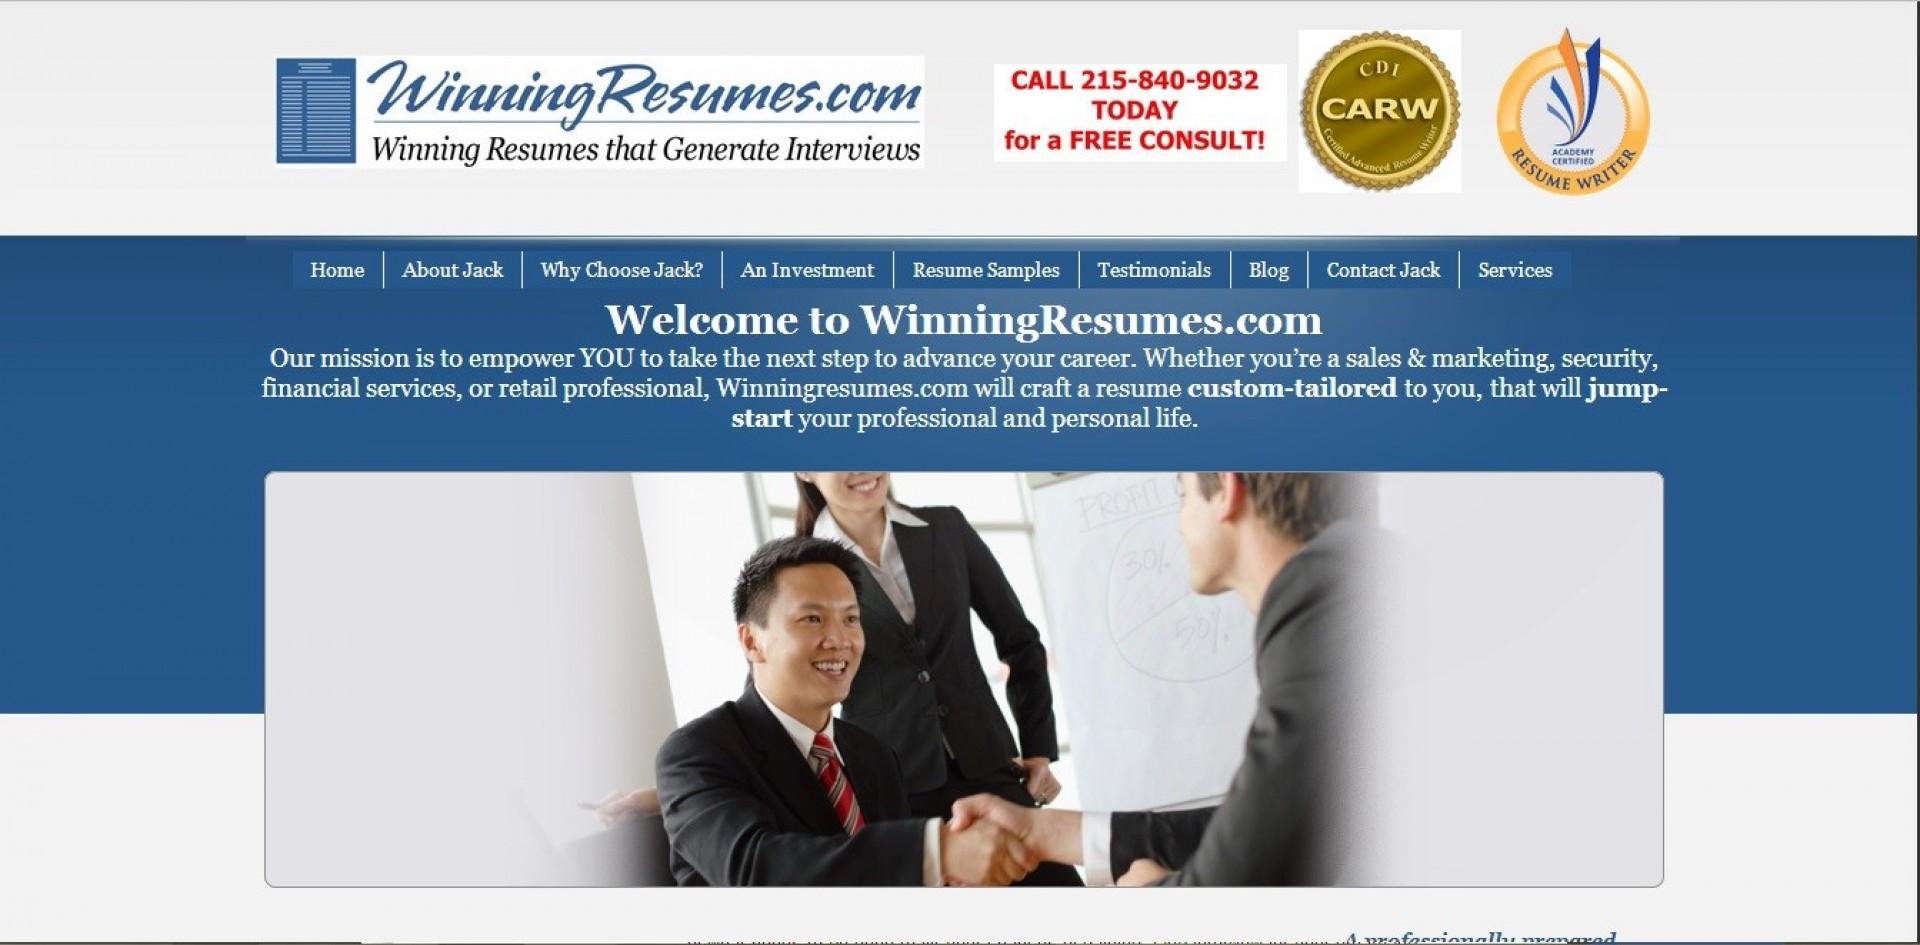 020 Custom Essay Example Winningresumes Com Dreaded Meister Discount Code Writing Service Reviews 1920